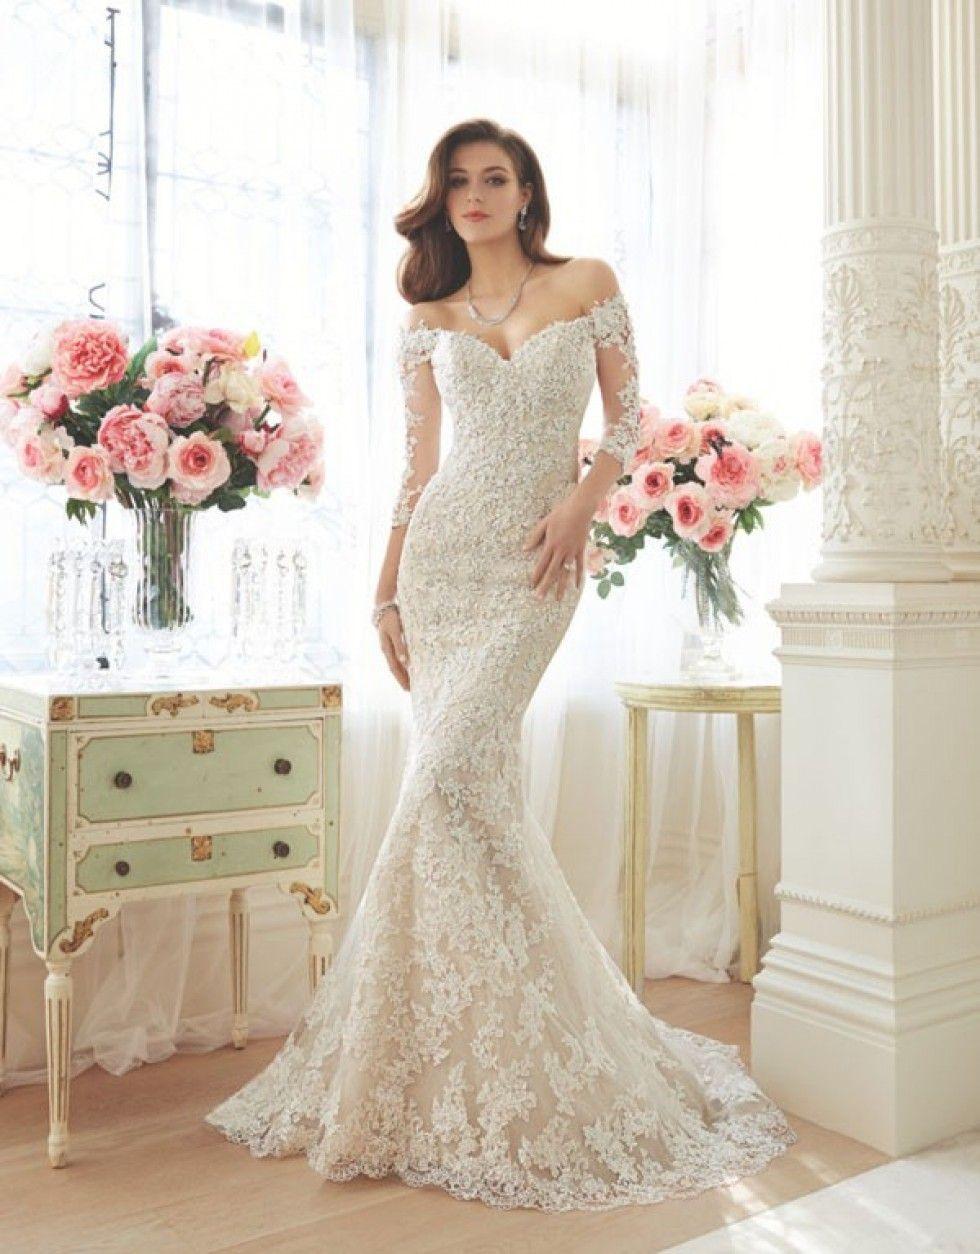 Vestido de novia - Sophia Tolli 11632 Riona   Odet Saüc   ropa ...